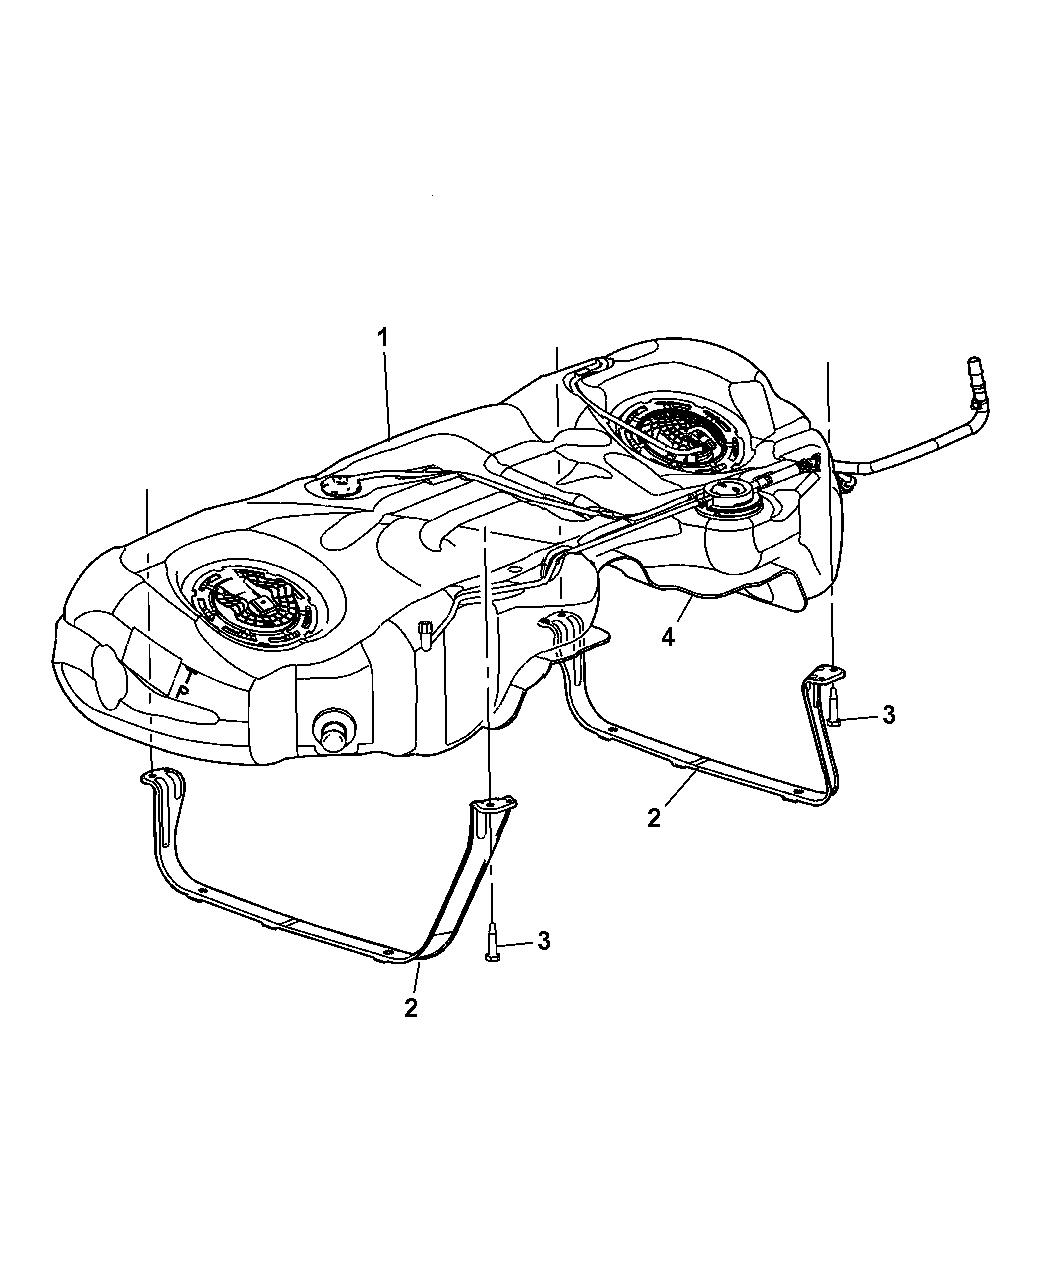 2005 chrysler 300 washer reservoir diagram 2005 chrysler 300 radio wiring diagram